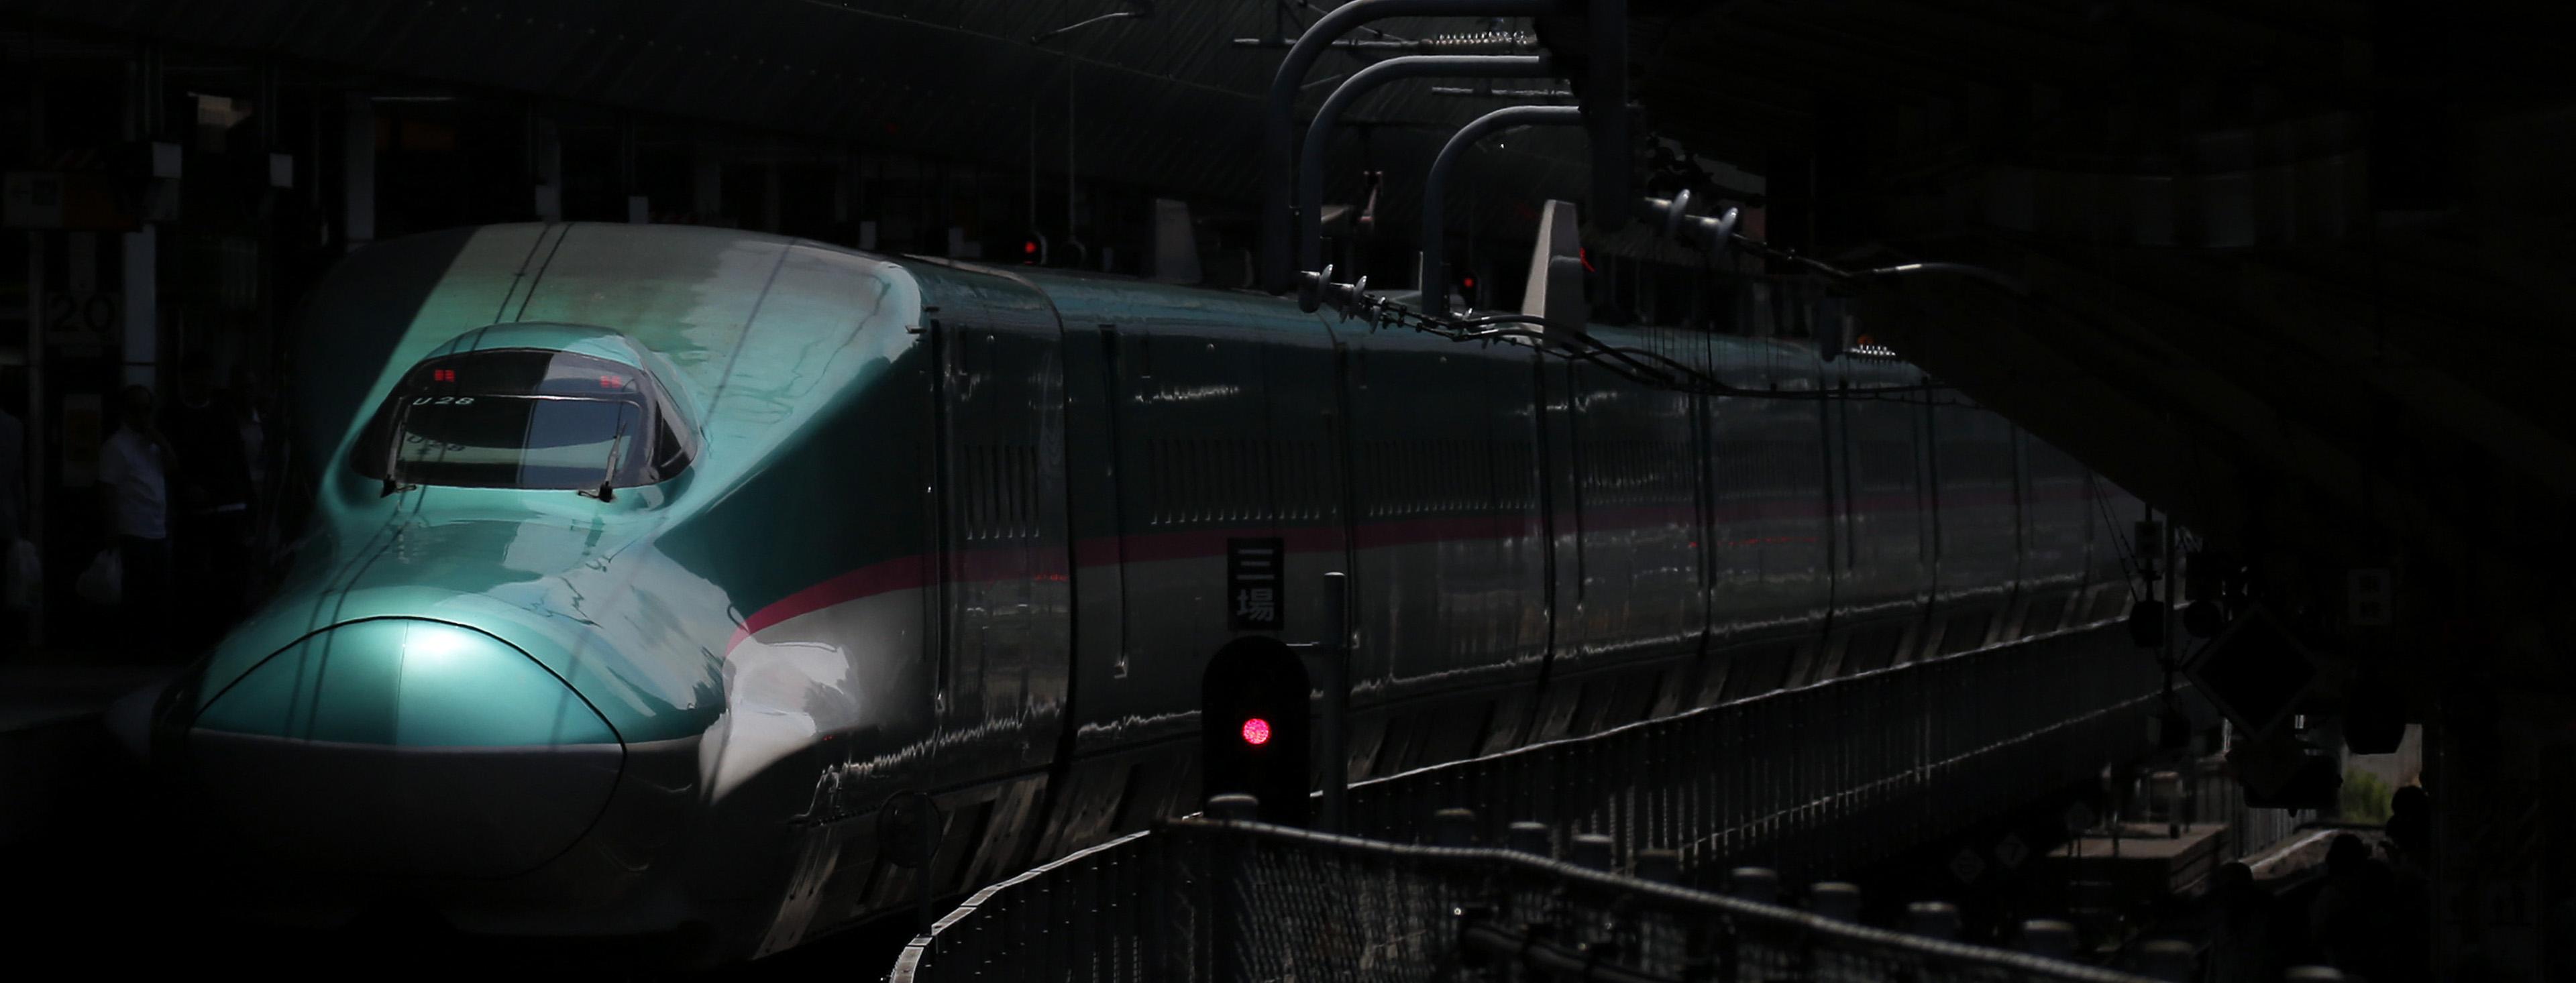 General Images Of High Speed Trains Ahead Of Thai Transport Minister Visit Regarding Bangkok-Chang Mai Rail Link